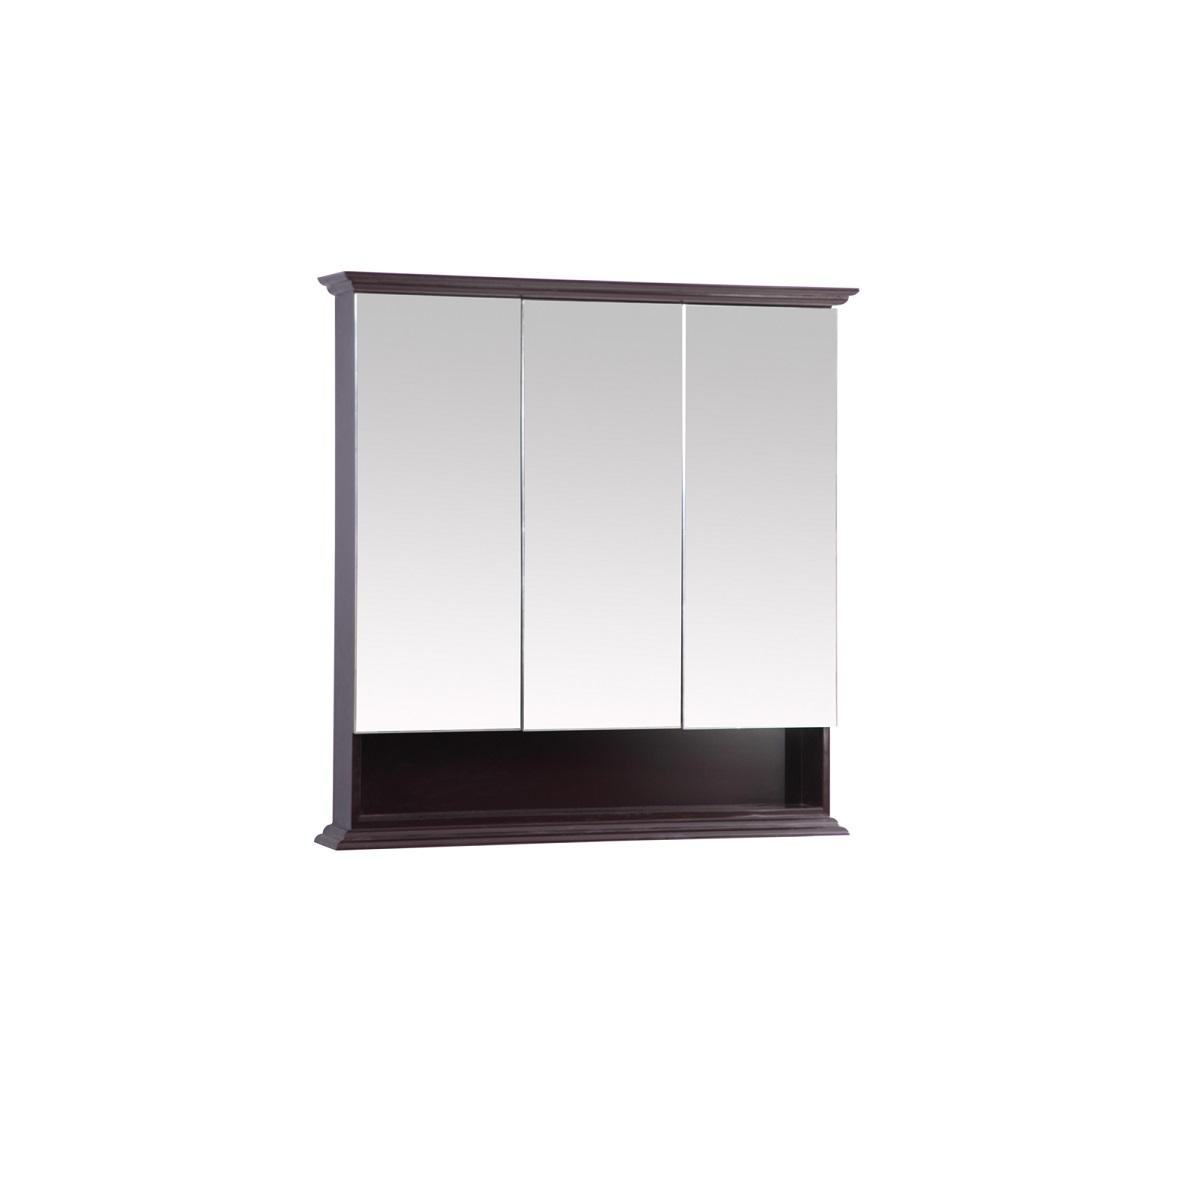 Miroir brun luxo marbreluxo marbre for Miroir french to english